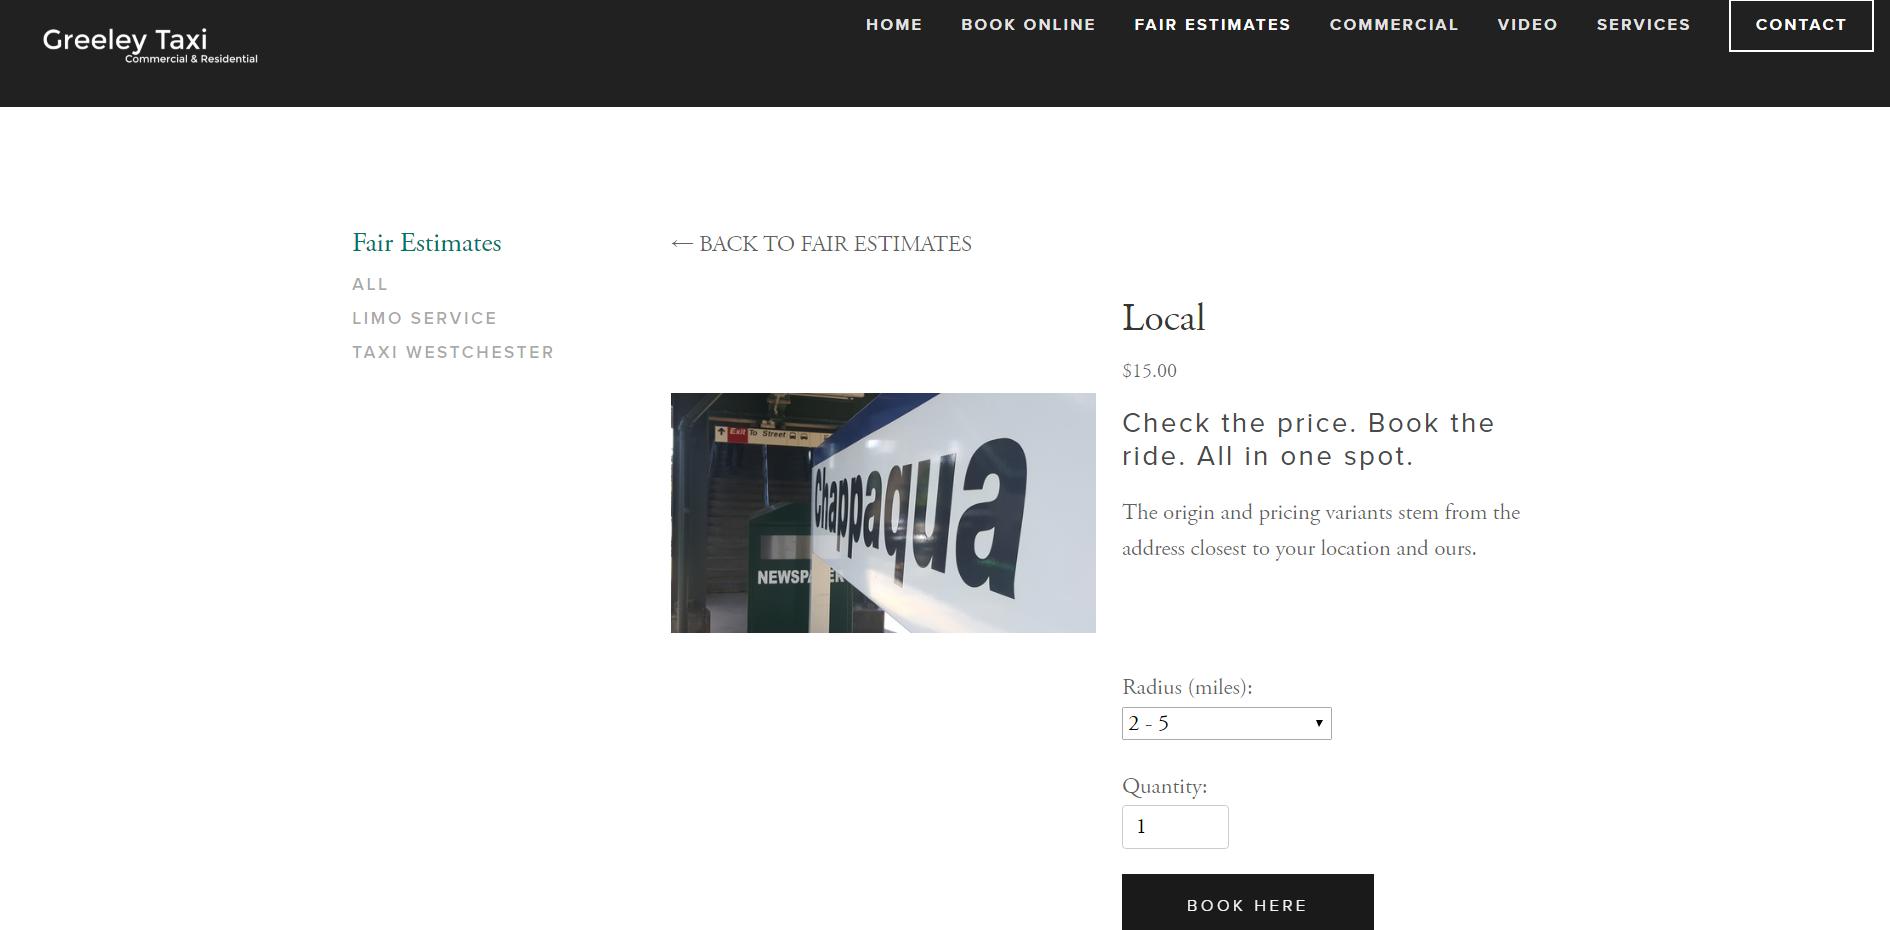 Greeley Local Price Radius.PNG